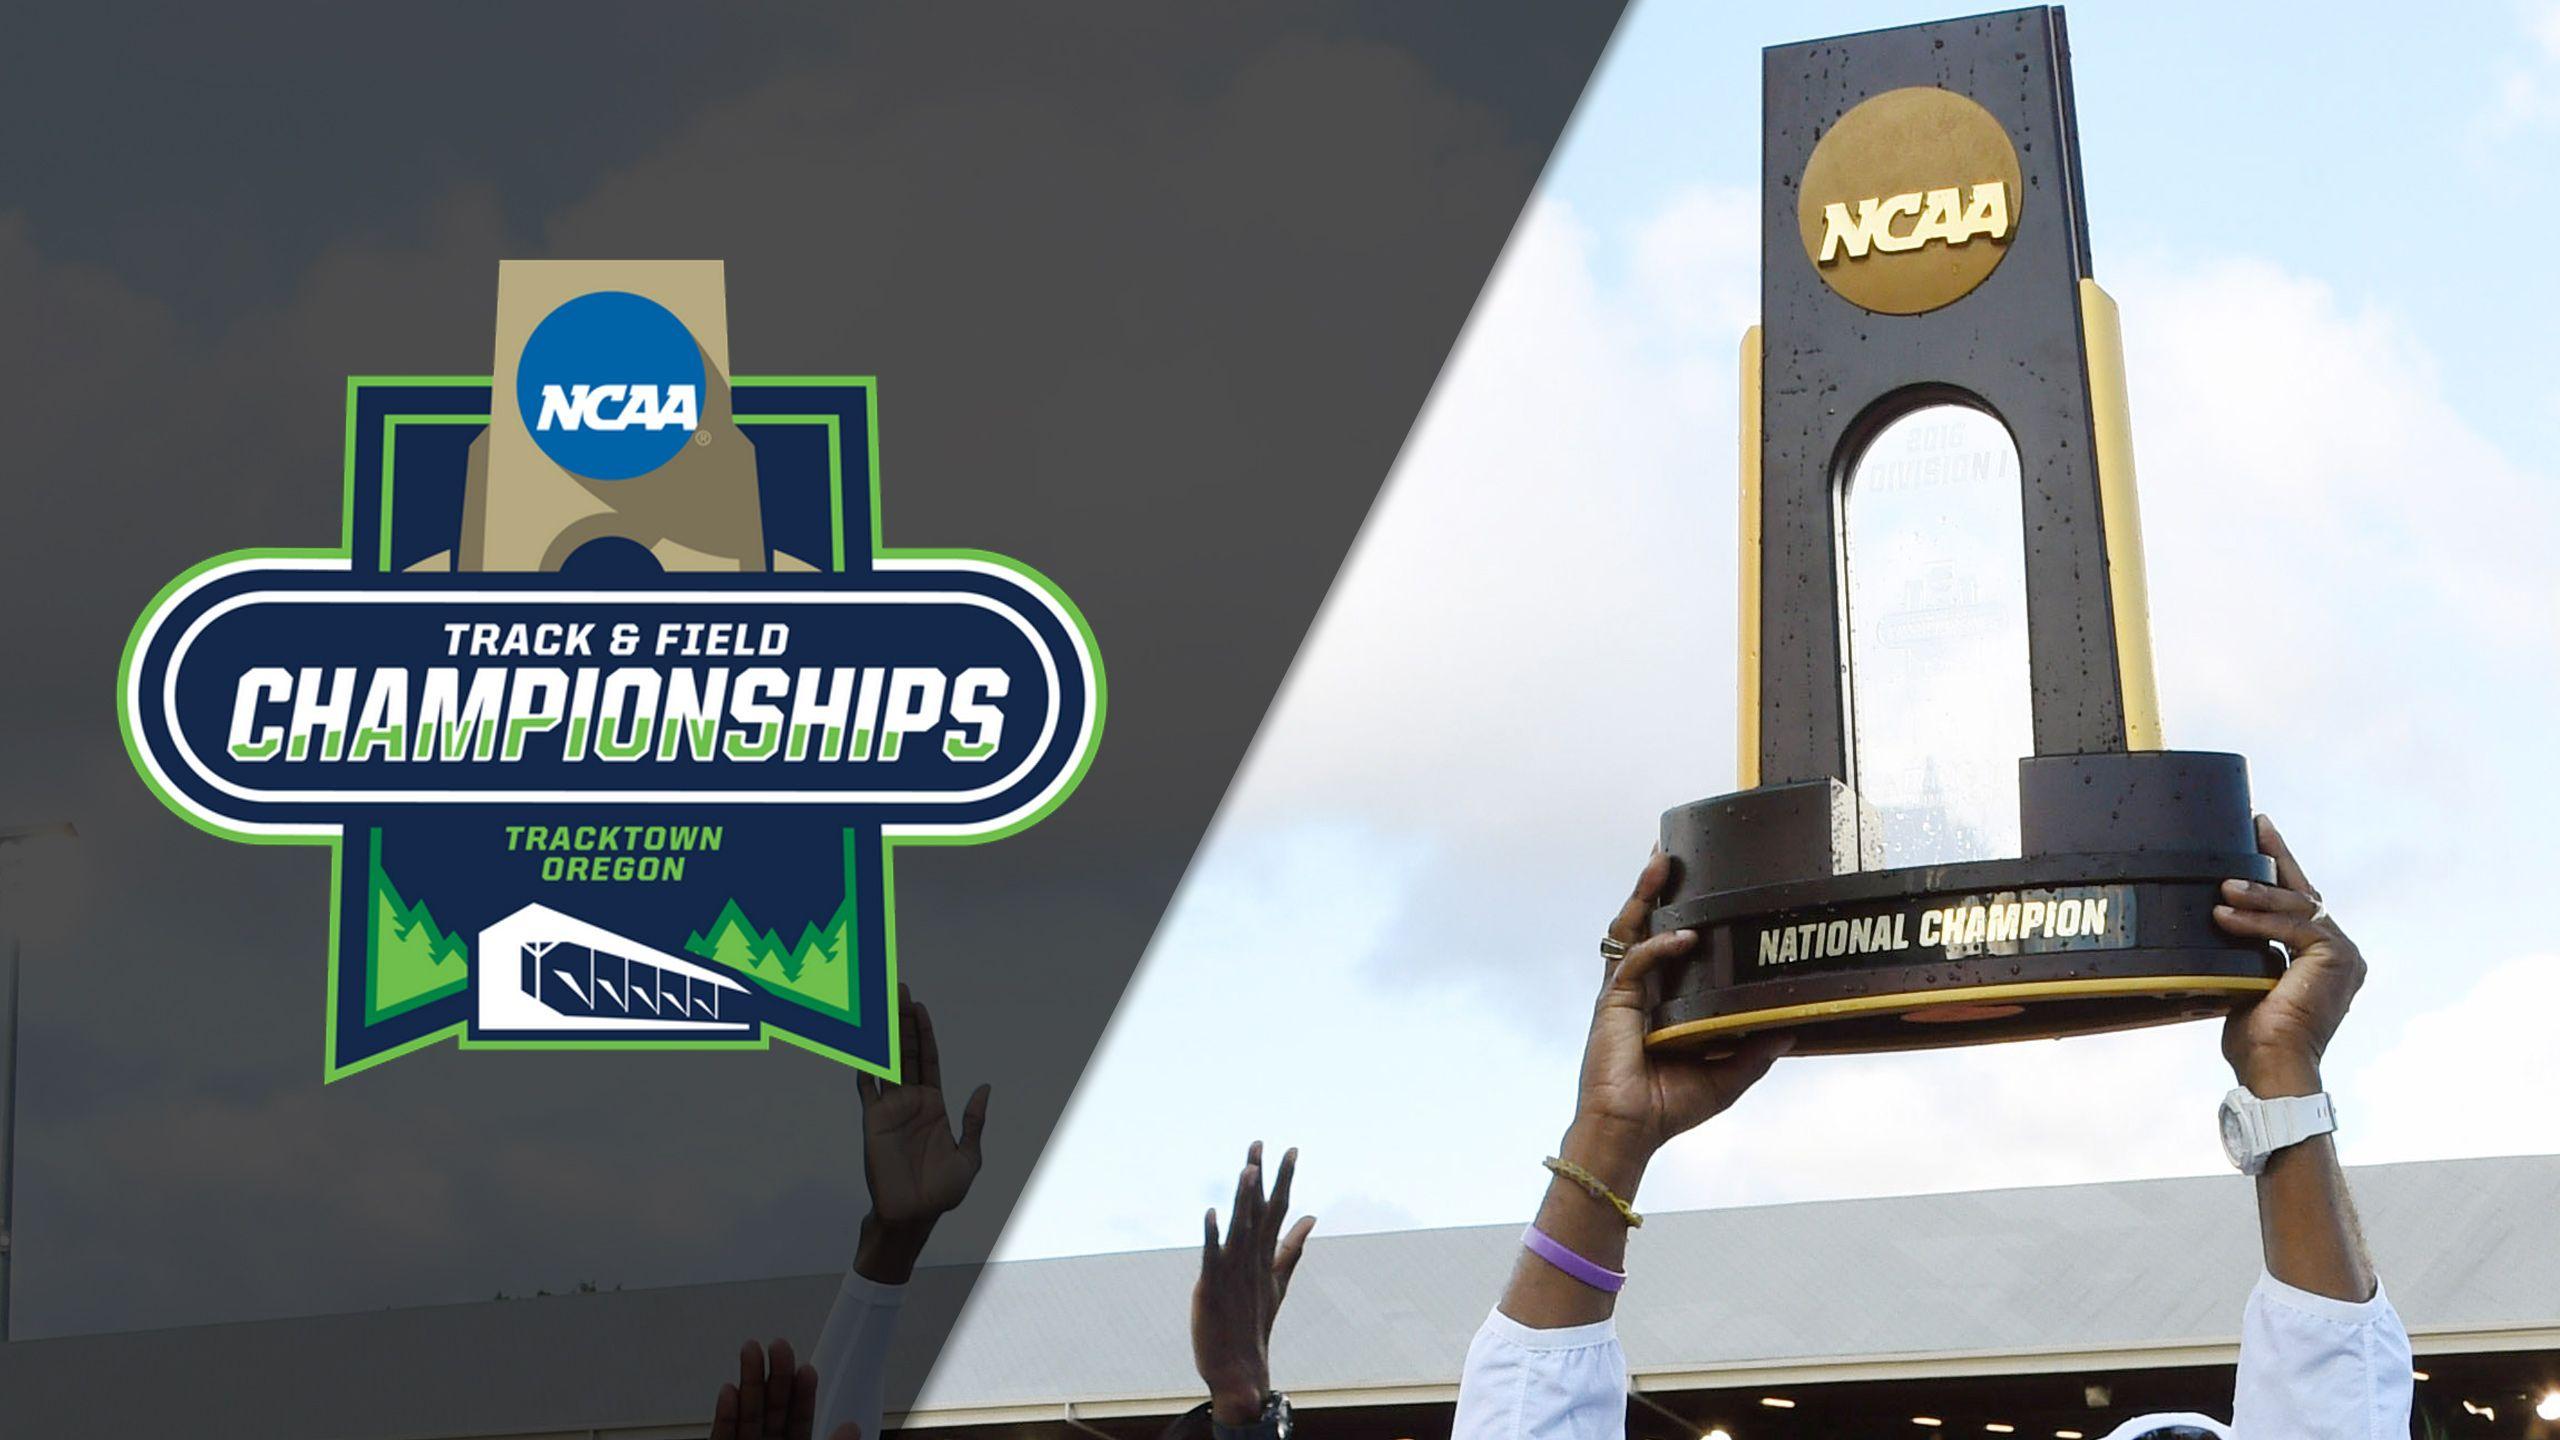 2017 NCAA Men's & Women's Track & Field Outdoor Championships Trophy Presentation